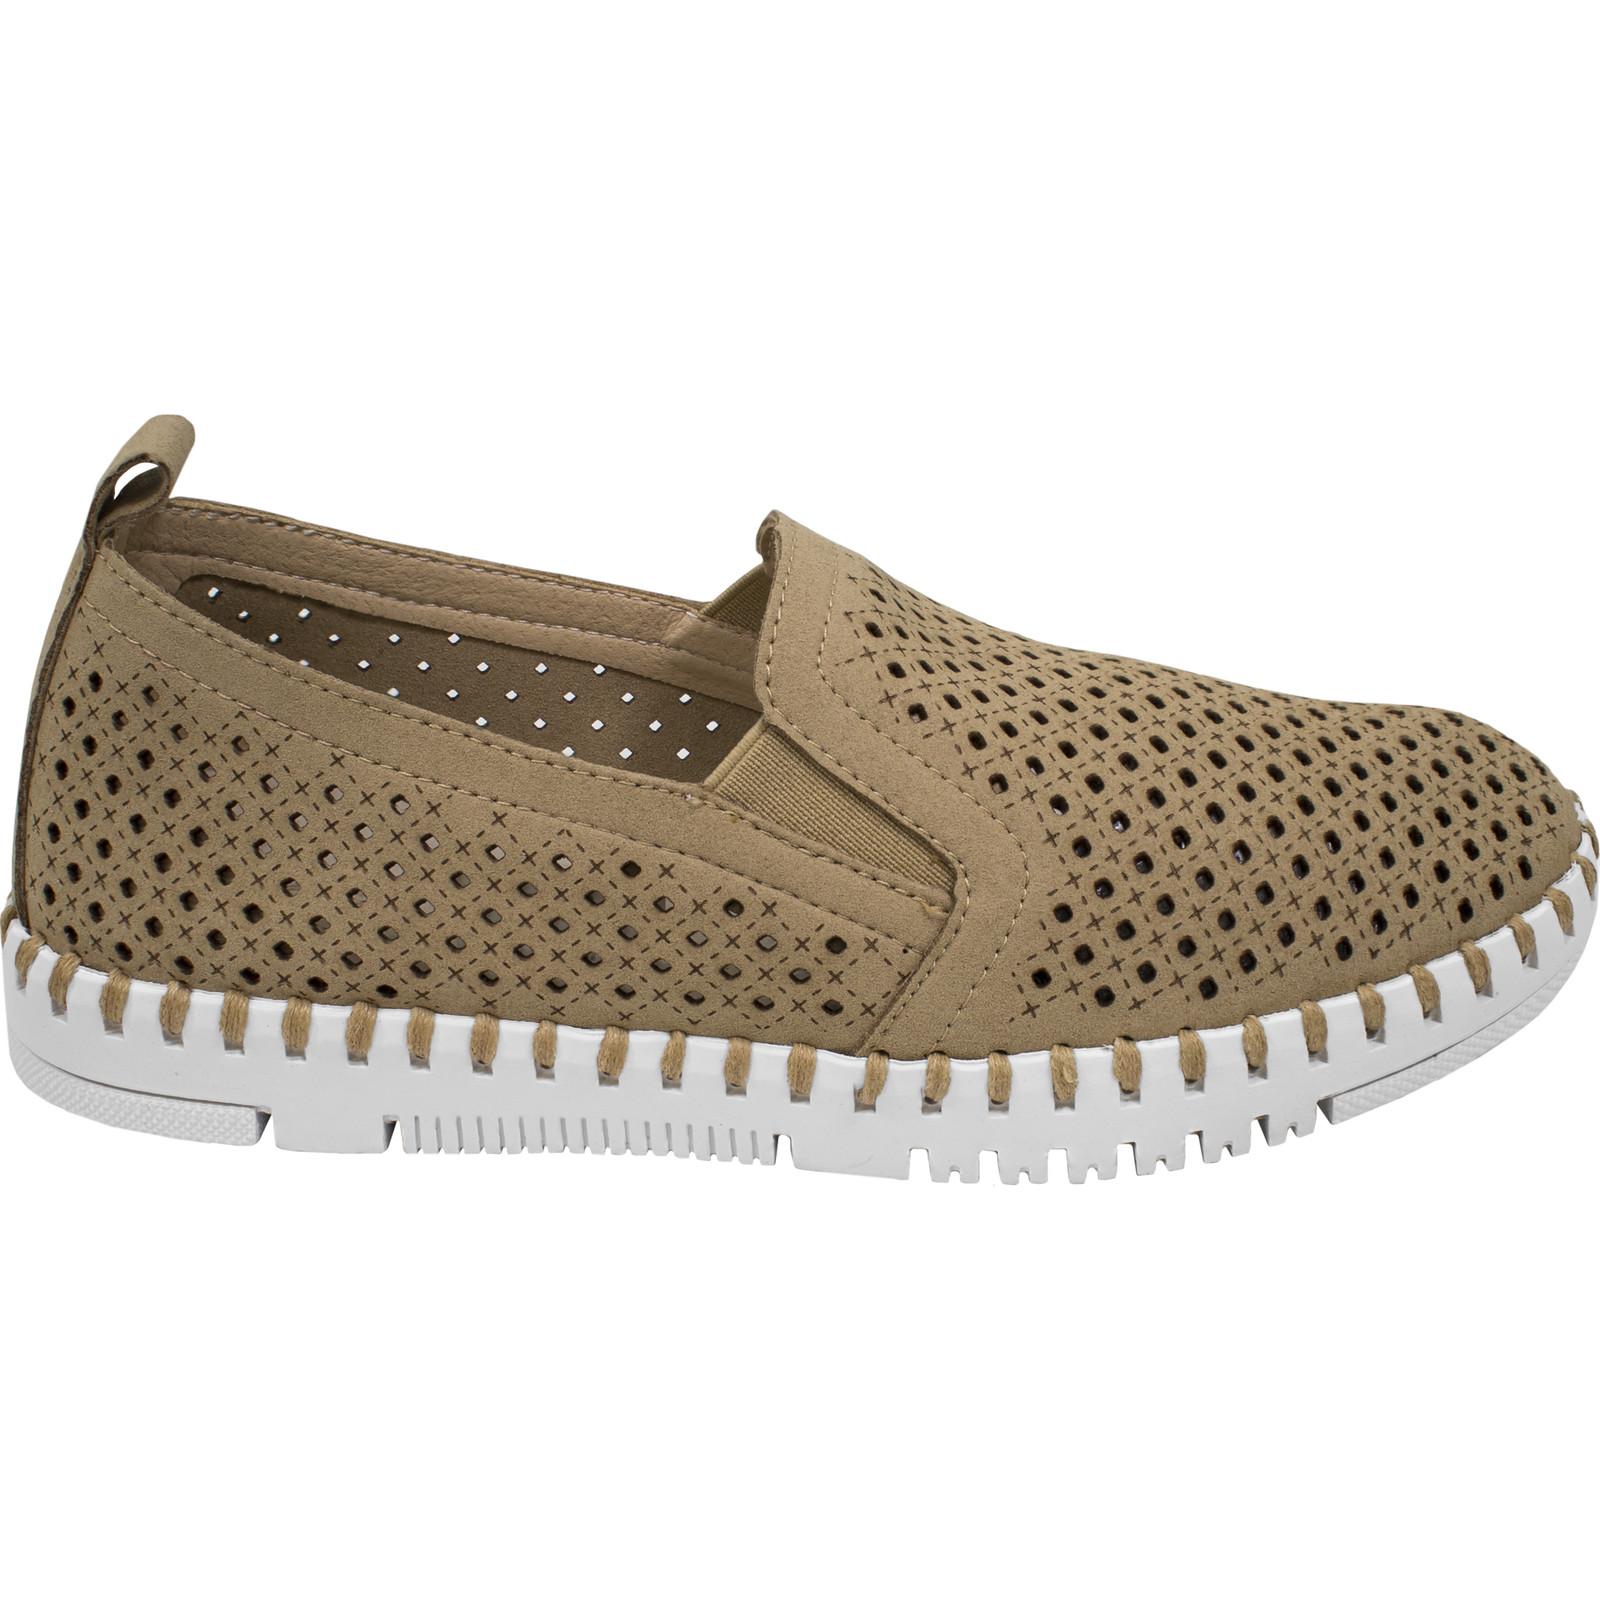 Women's Travelers Slip-On Shoe-large